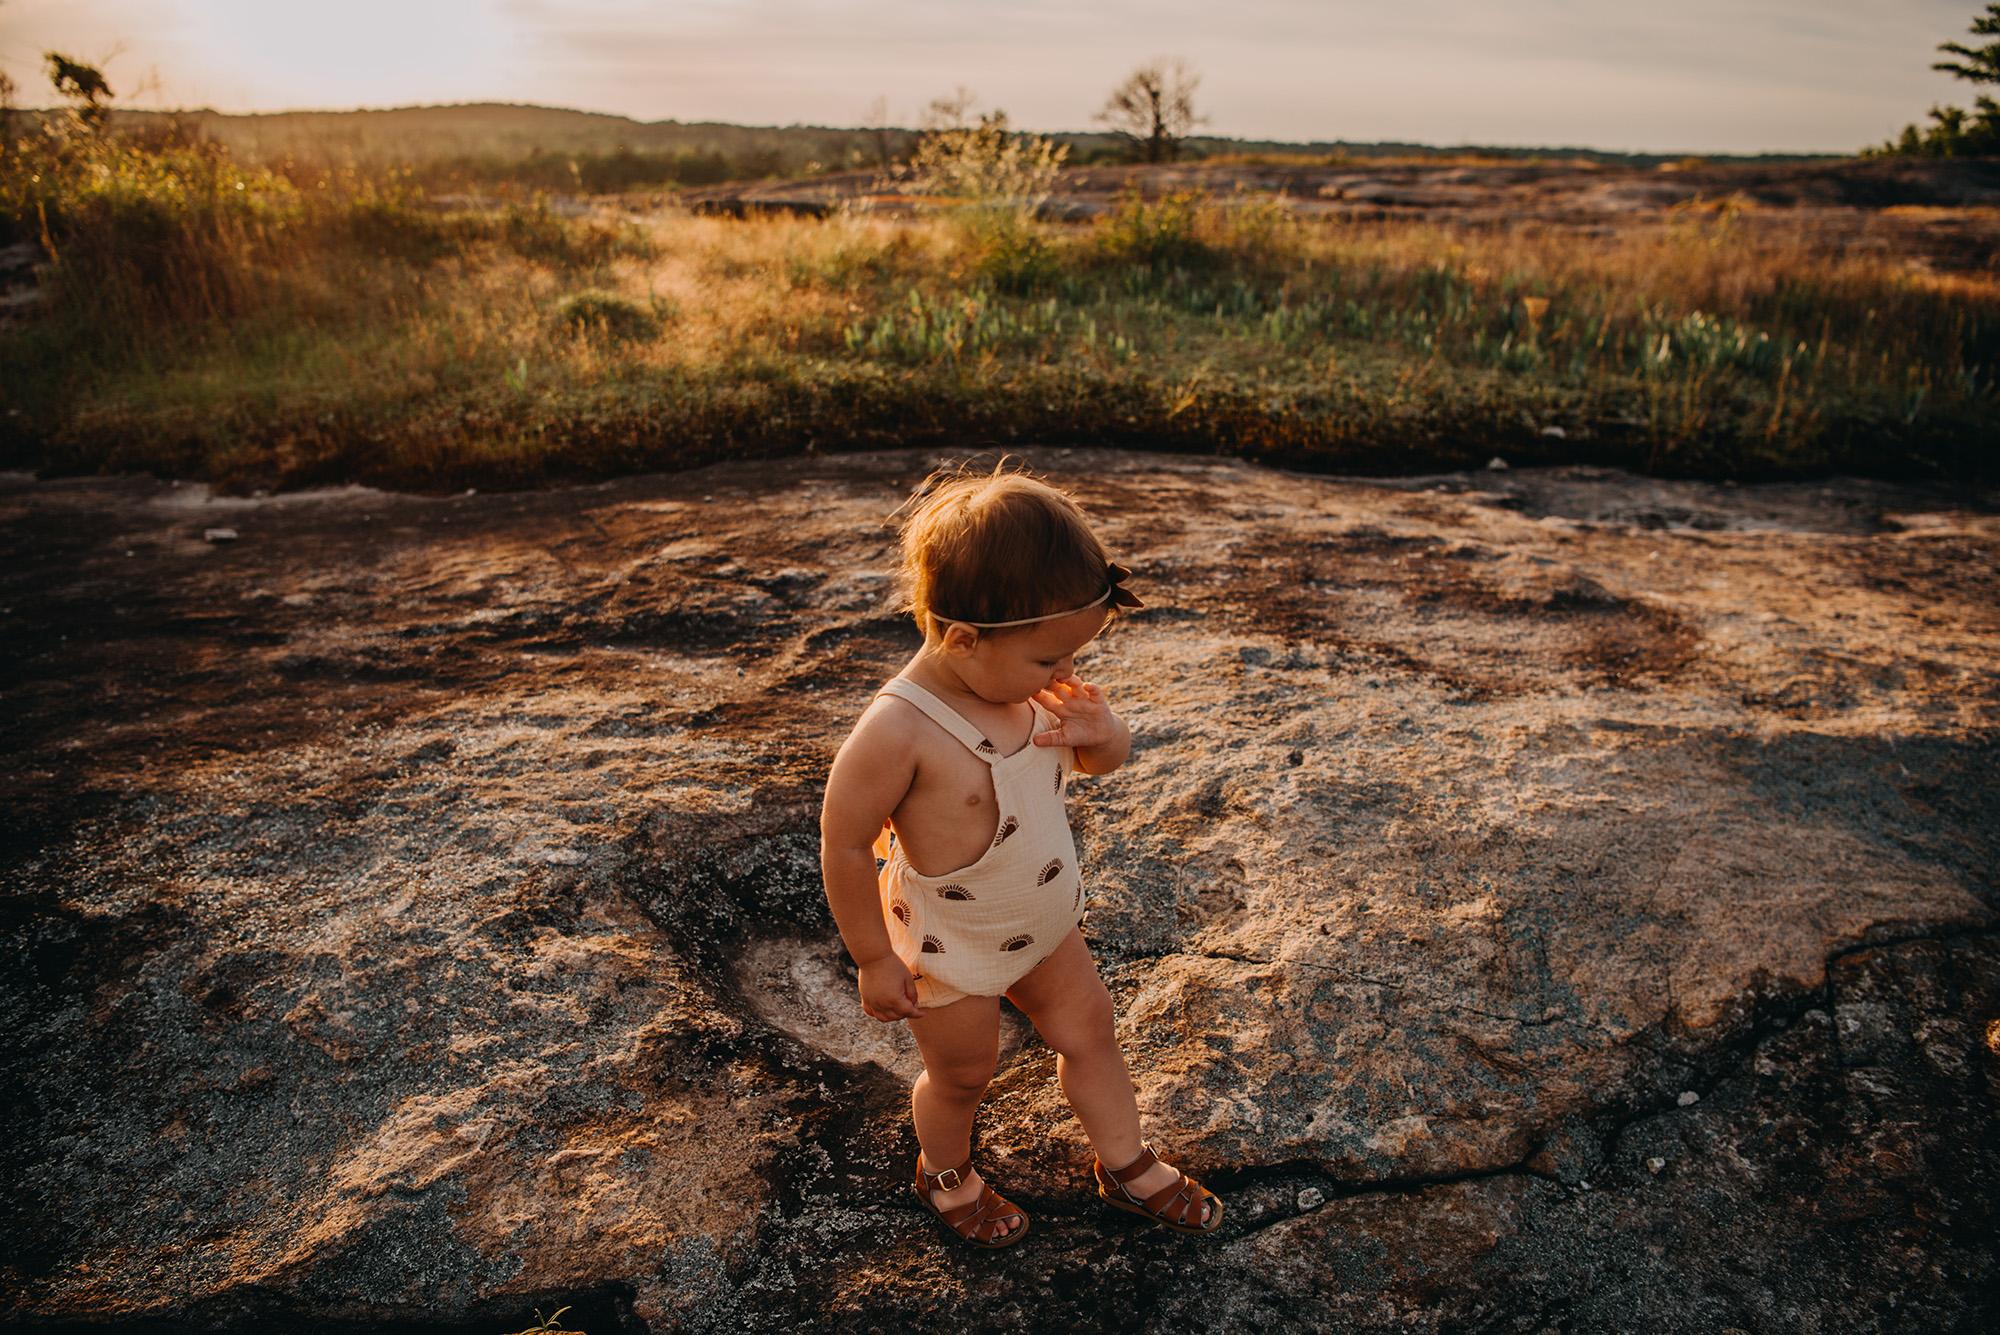 Arabia-mountain-atlanta-family-photographers-baby-girl-golden-hour-sunet